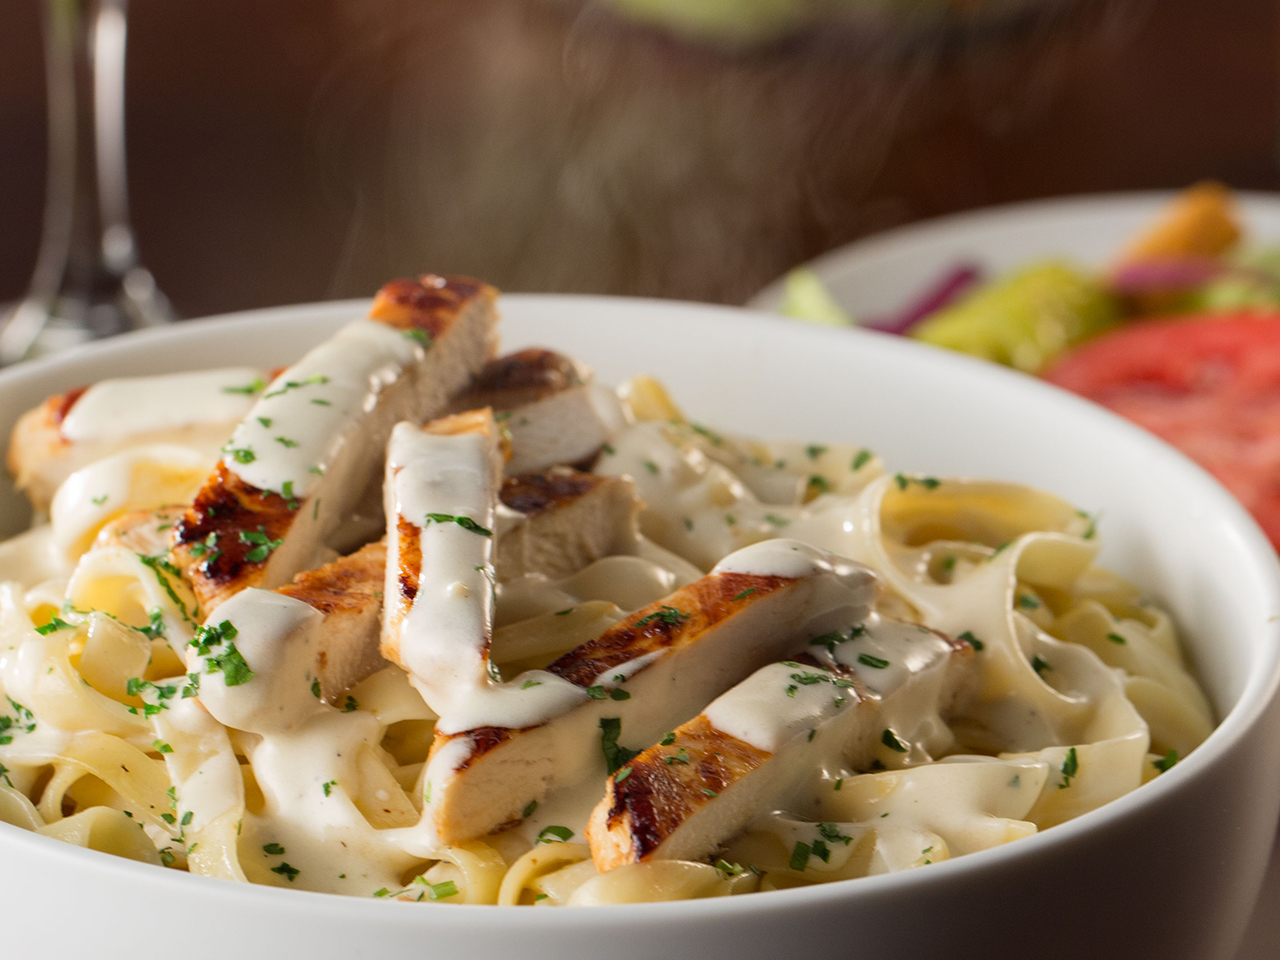 Olive Garden Italian Restaurant, Owensboro KY